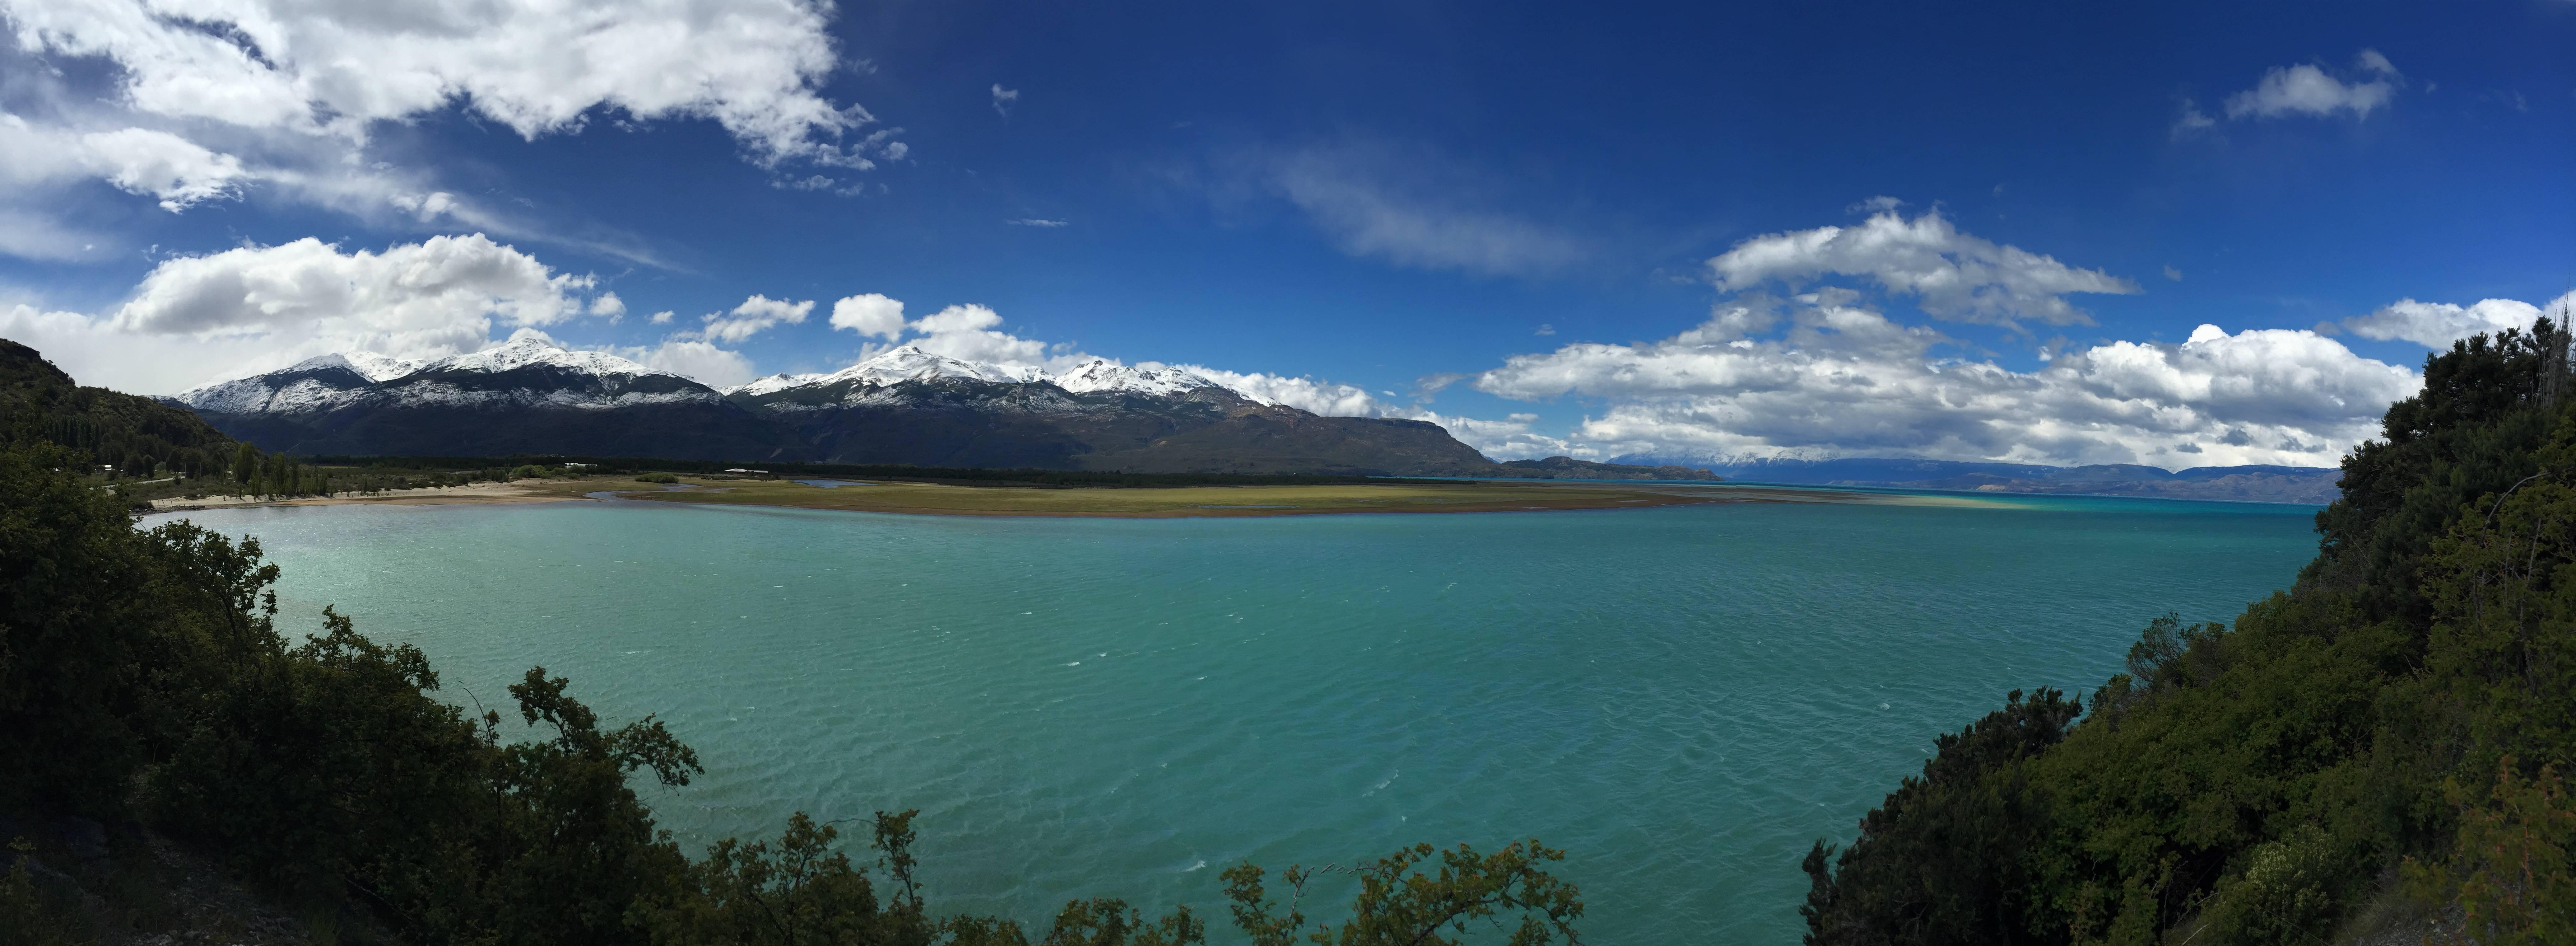 Photo 3: Lago General Carrera, l'eau turquoise de Bora Bora 30° en moins